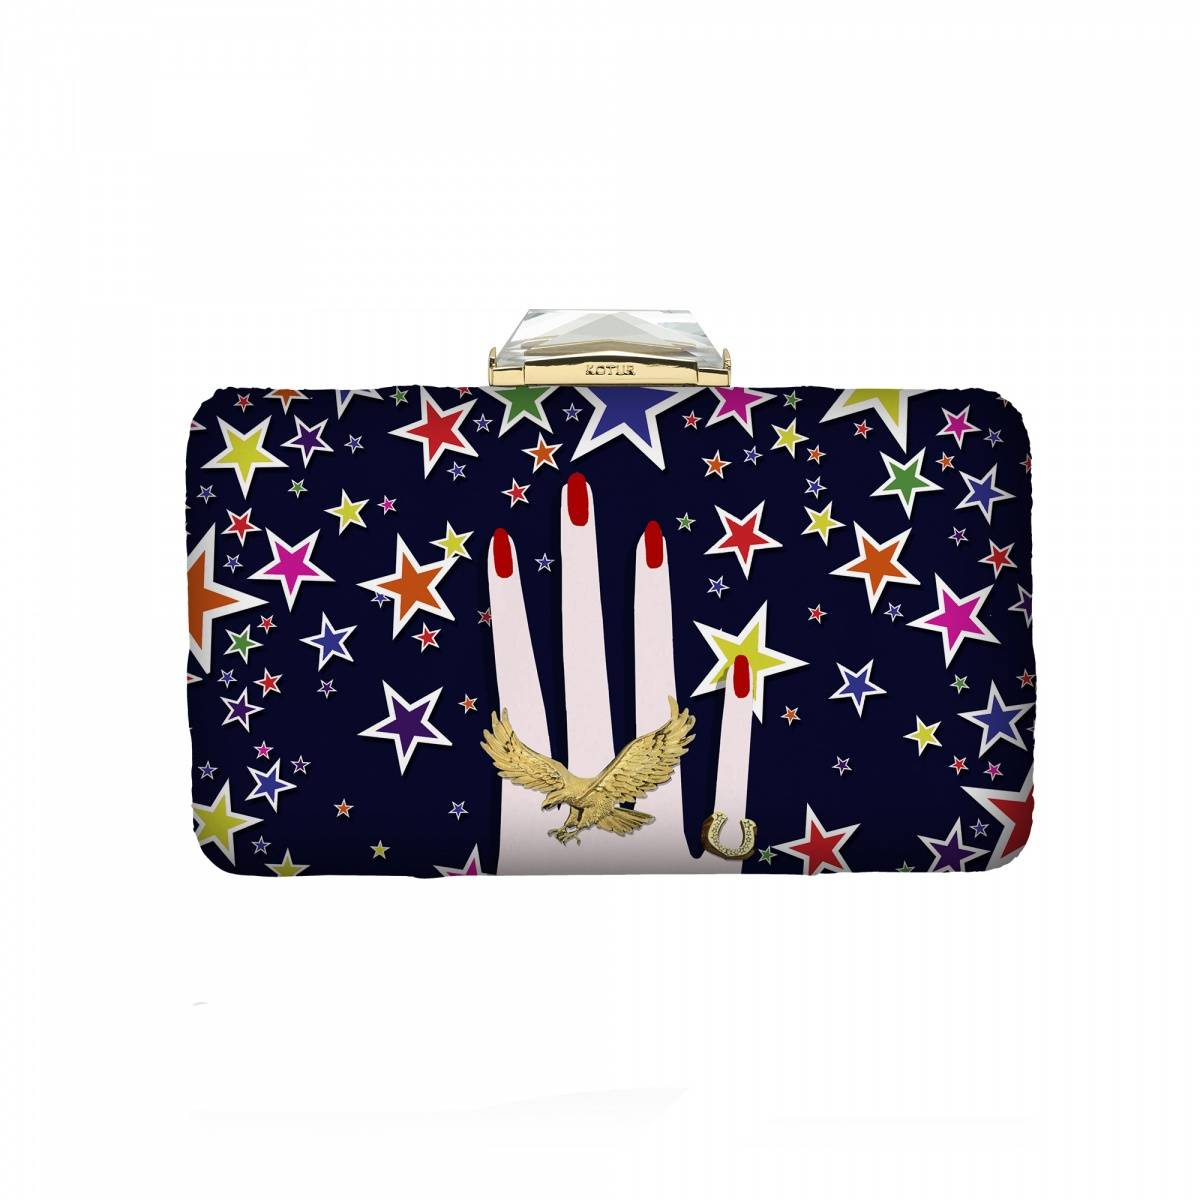 Star Manicure Navy partI mock up